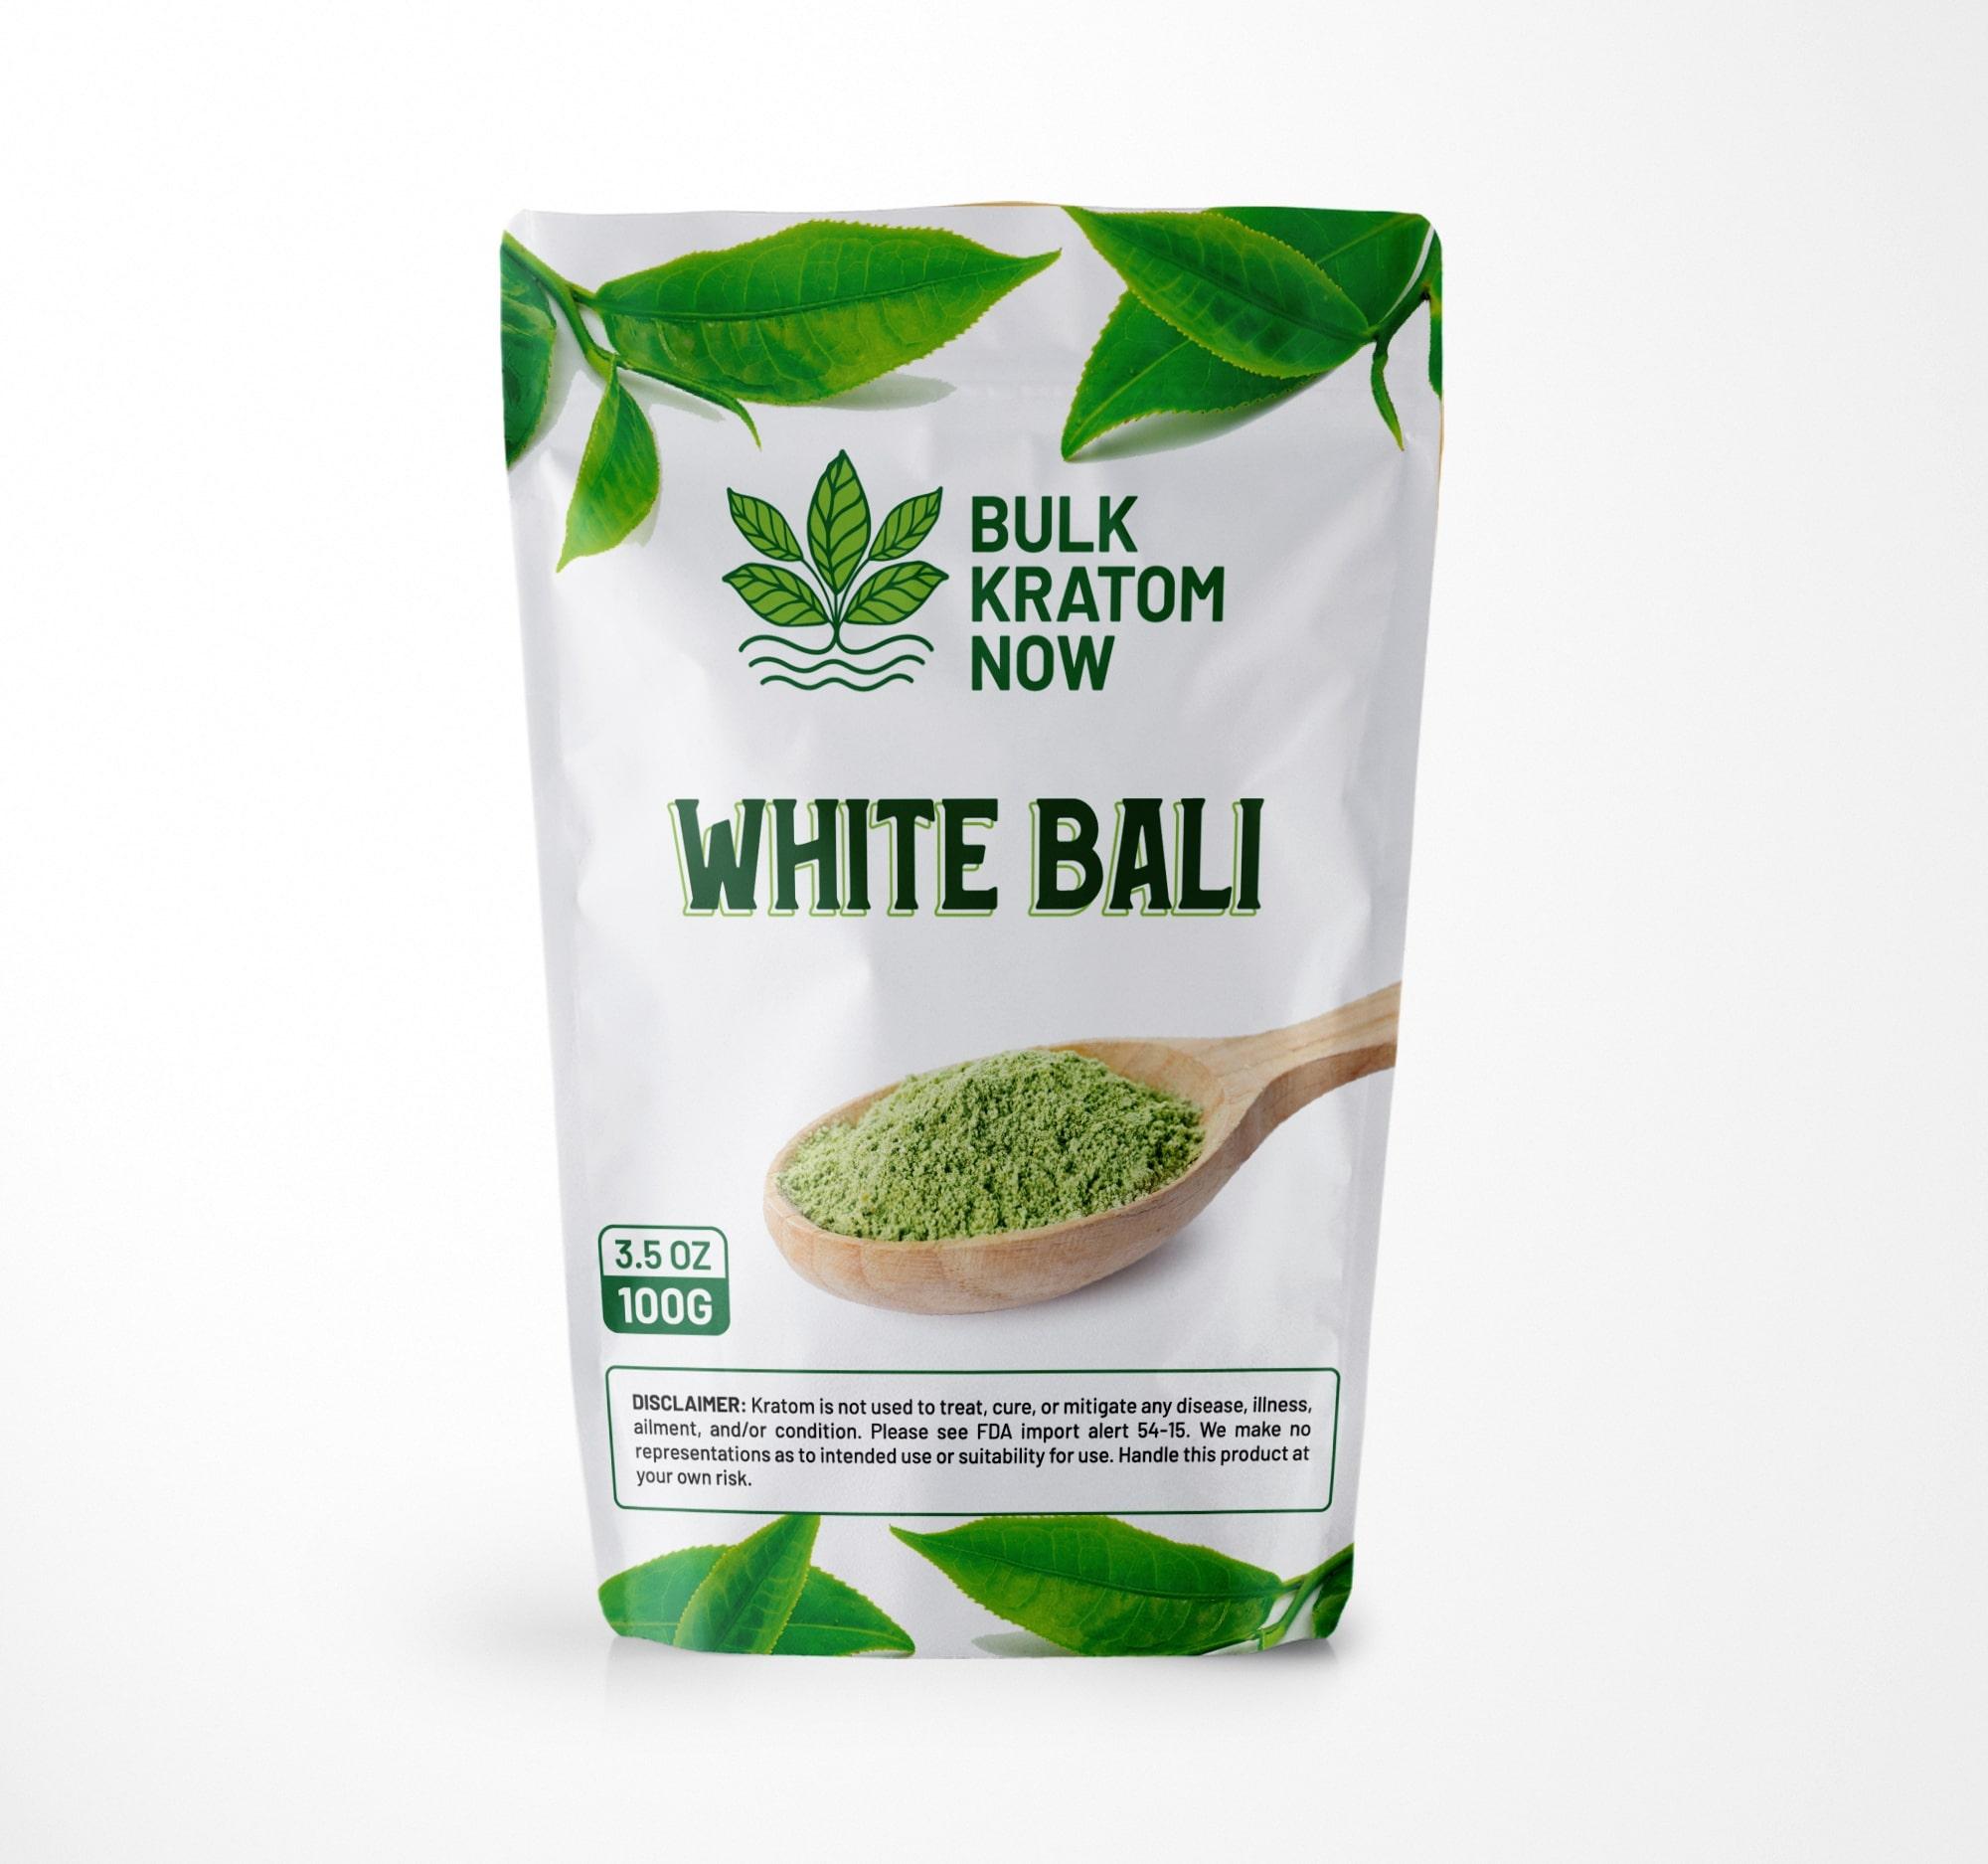 White Bali Bulk Kratom